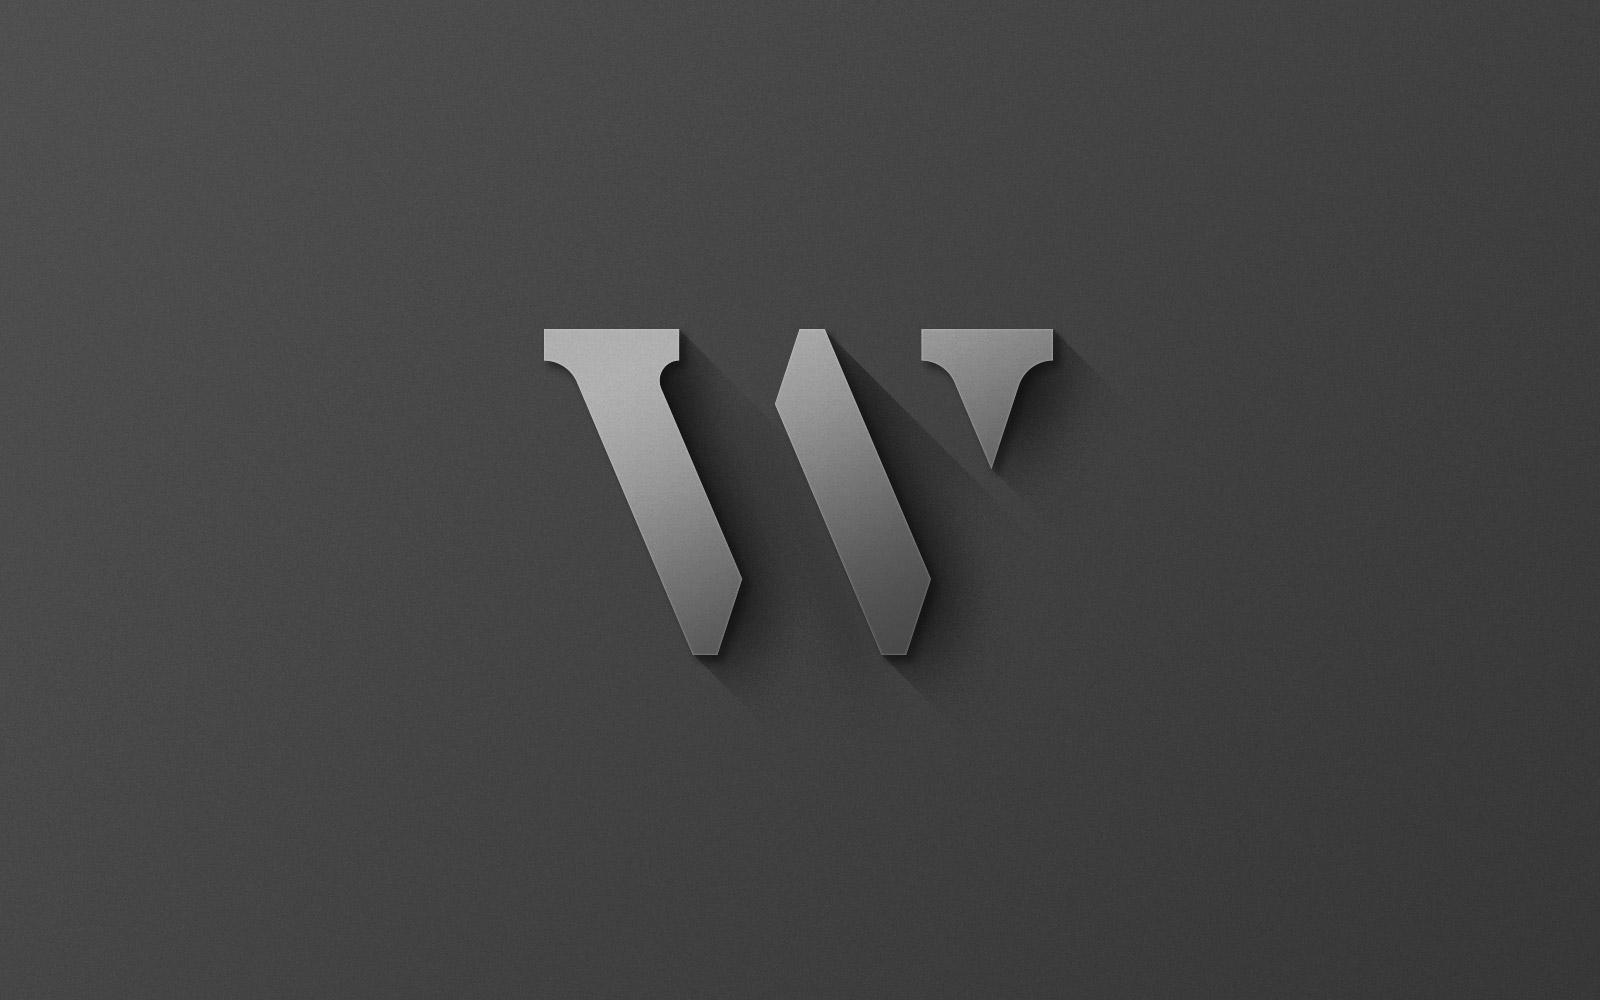 wagner_visual_1600p